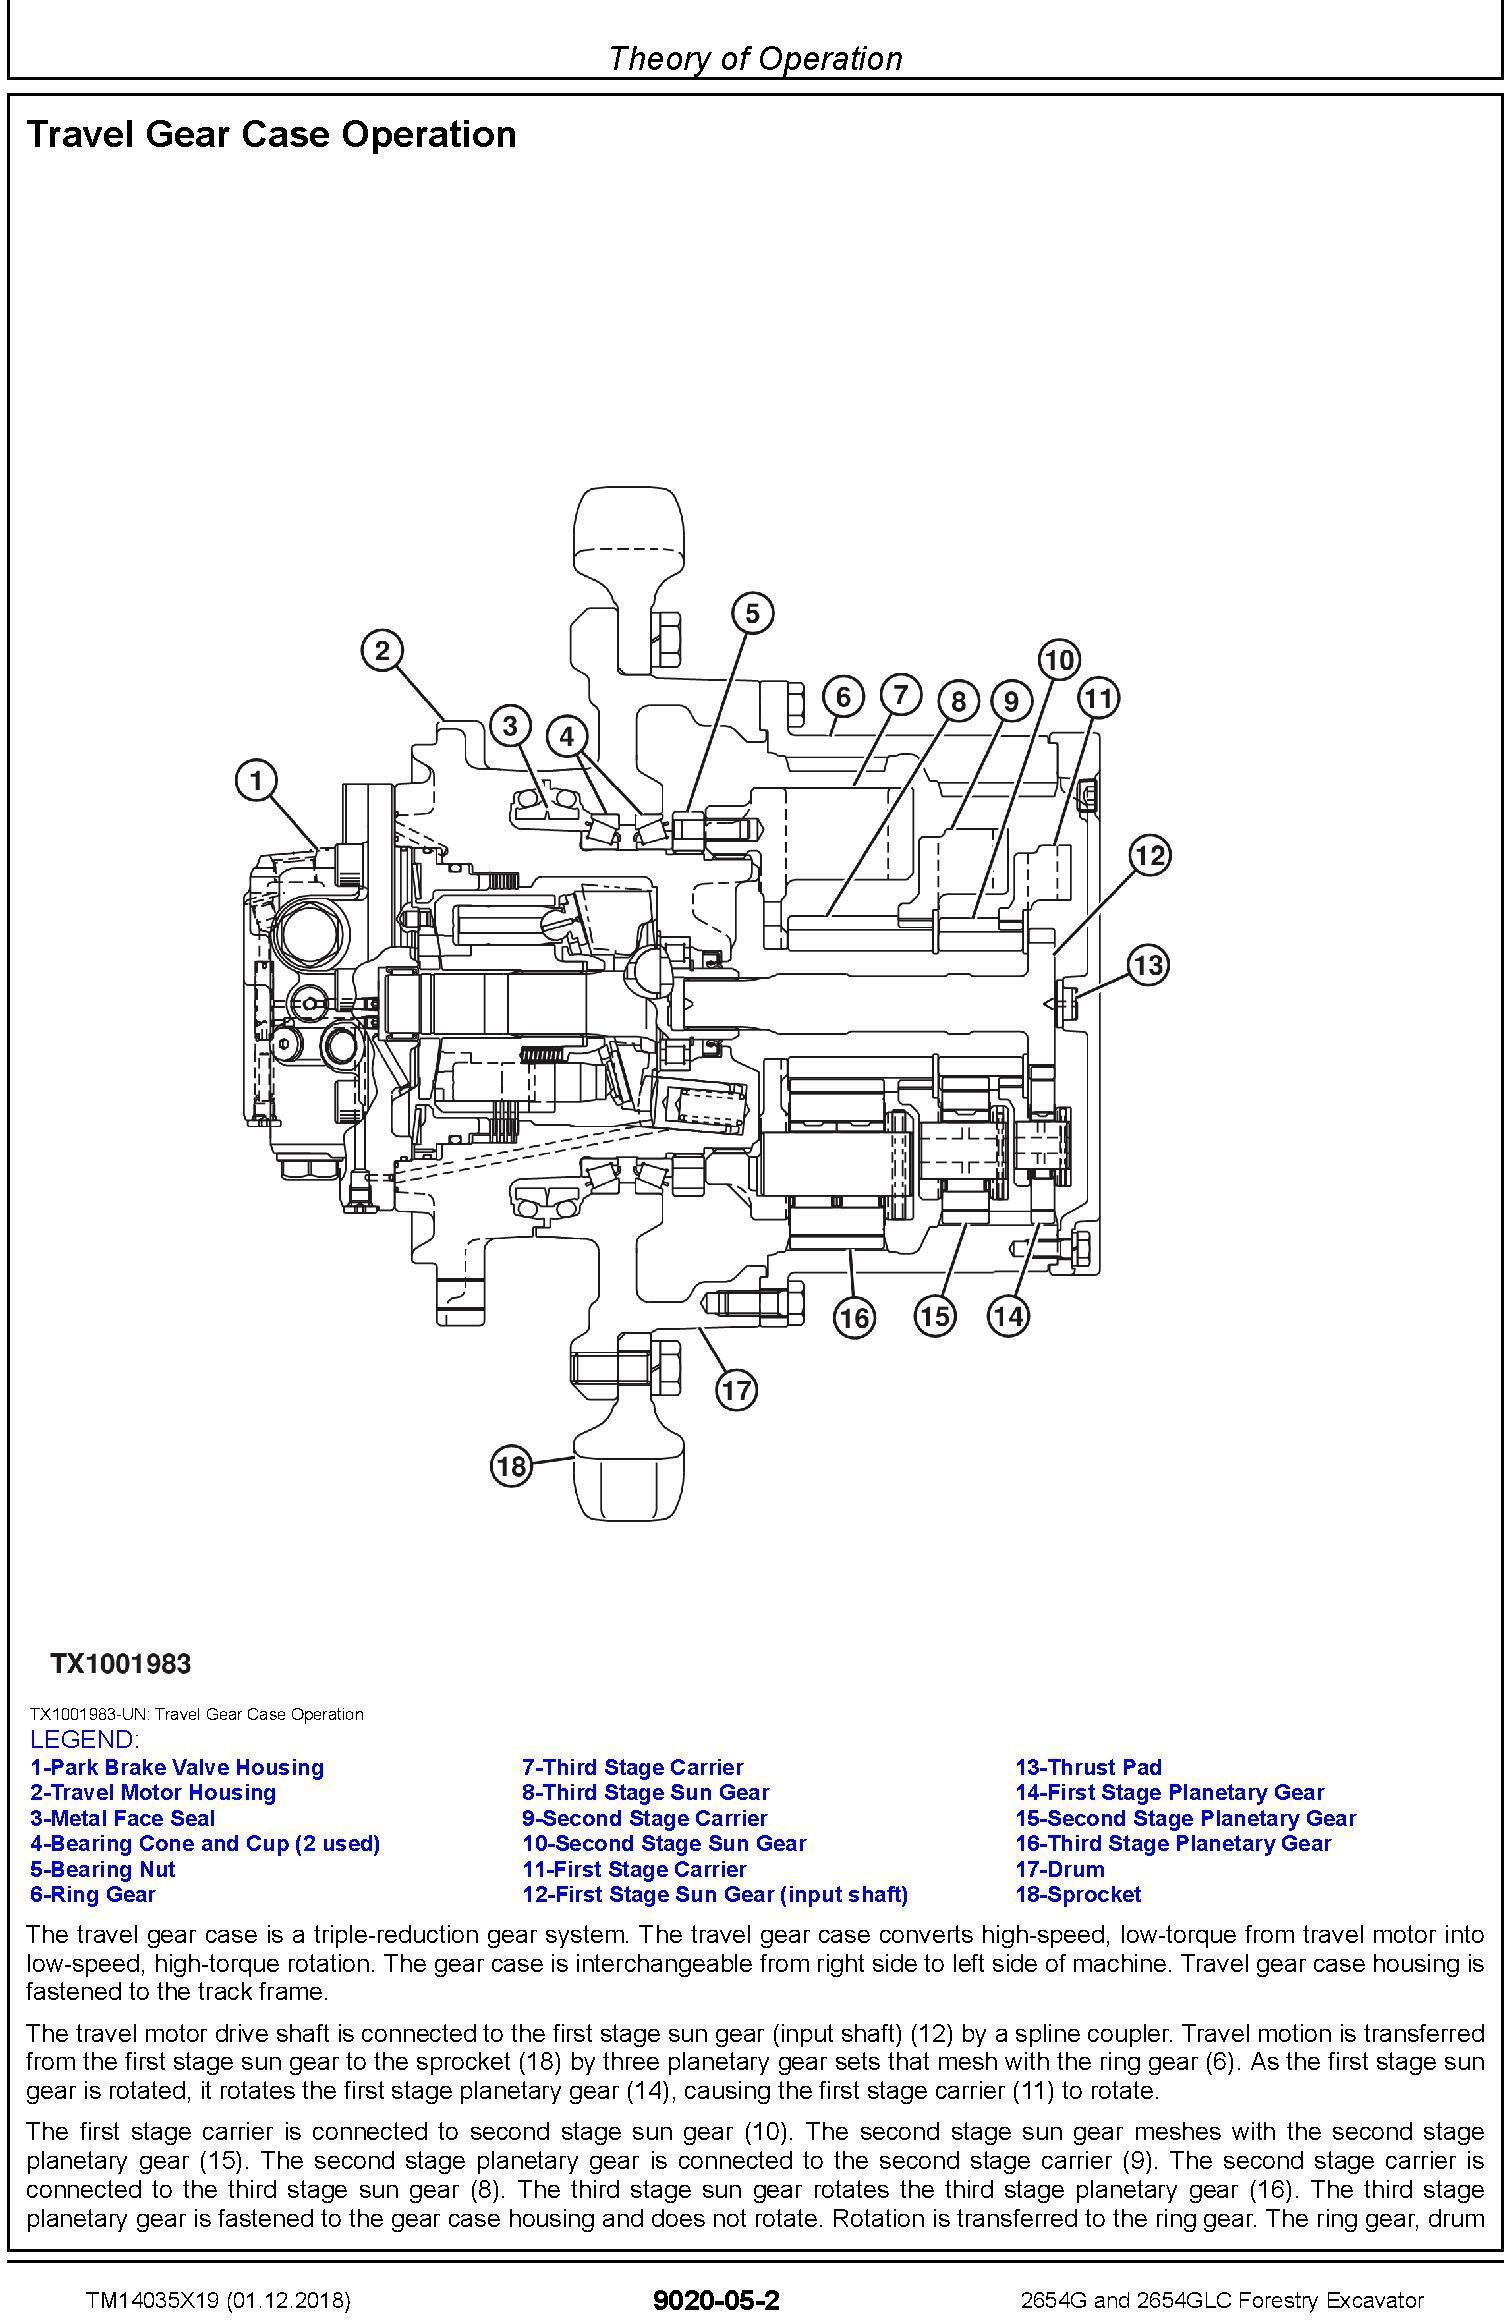 John Deere 2654G, 2654GLC (SN. C260001-, D260001-) Forestry Excavator Diagnostic Manual (TM14035X19) - 1